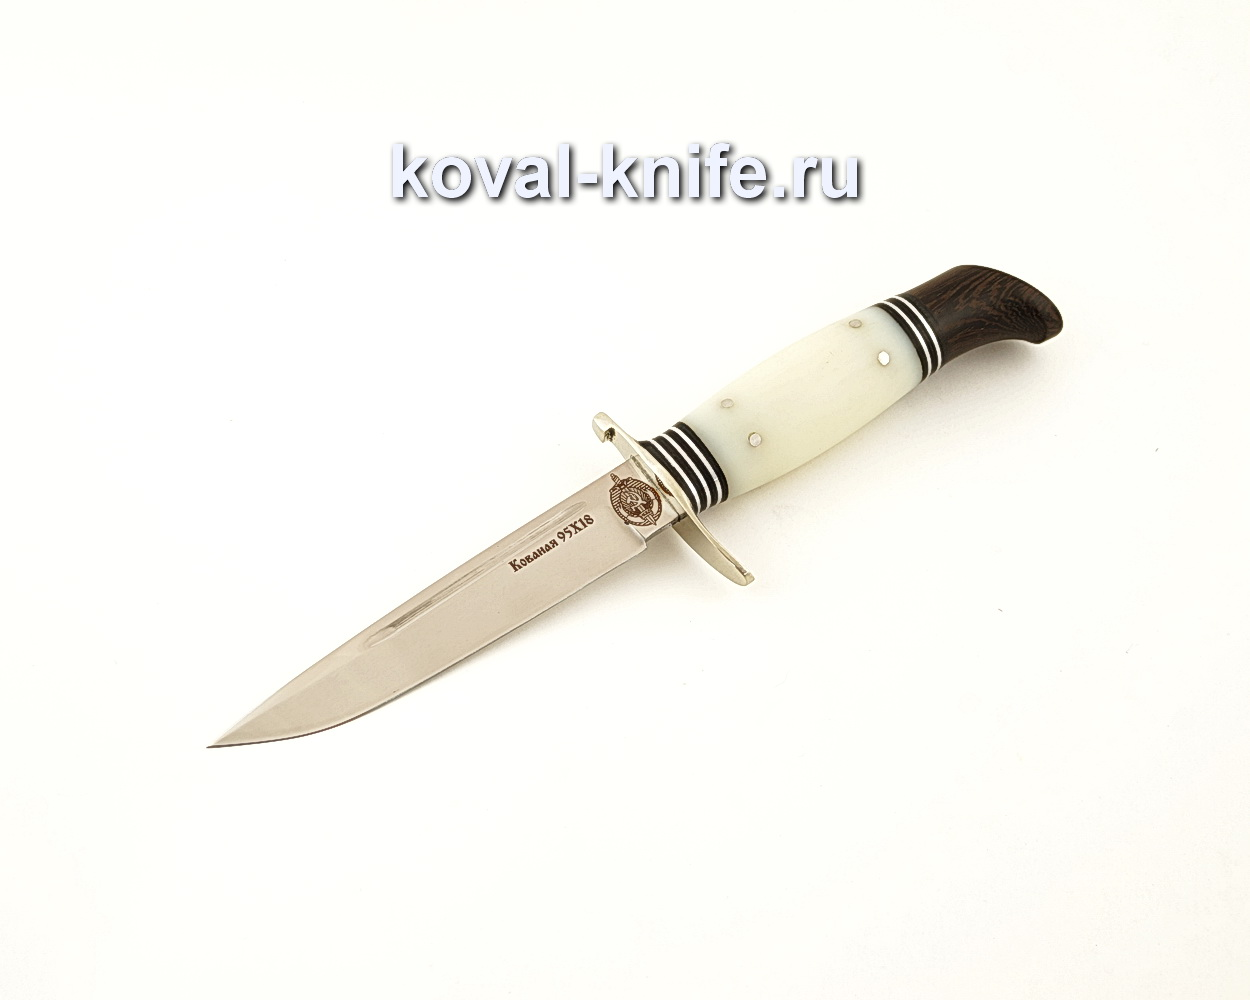 Нож финка НКВД из кованой стали 95Х18 с рукоятью из пластика  A622